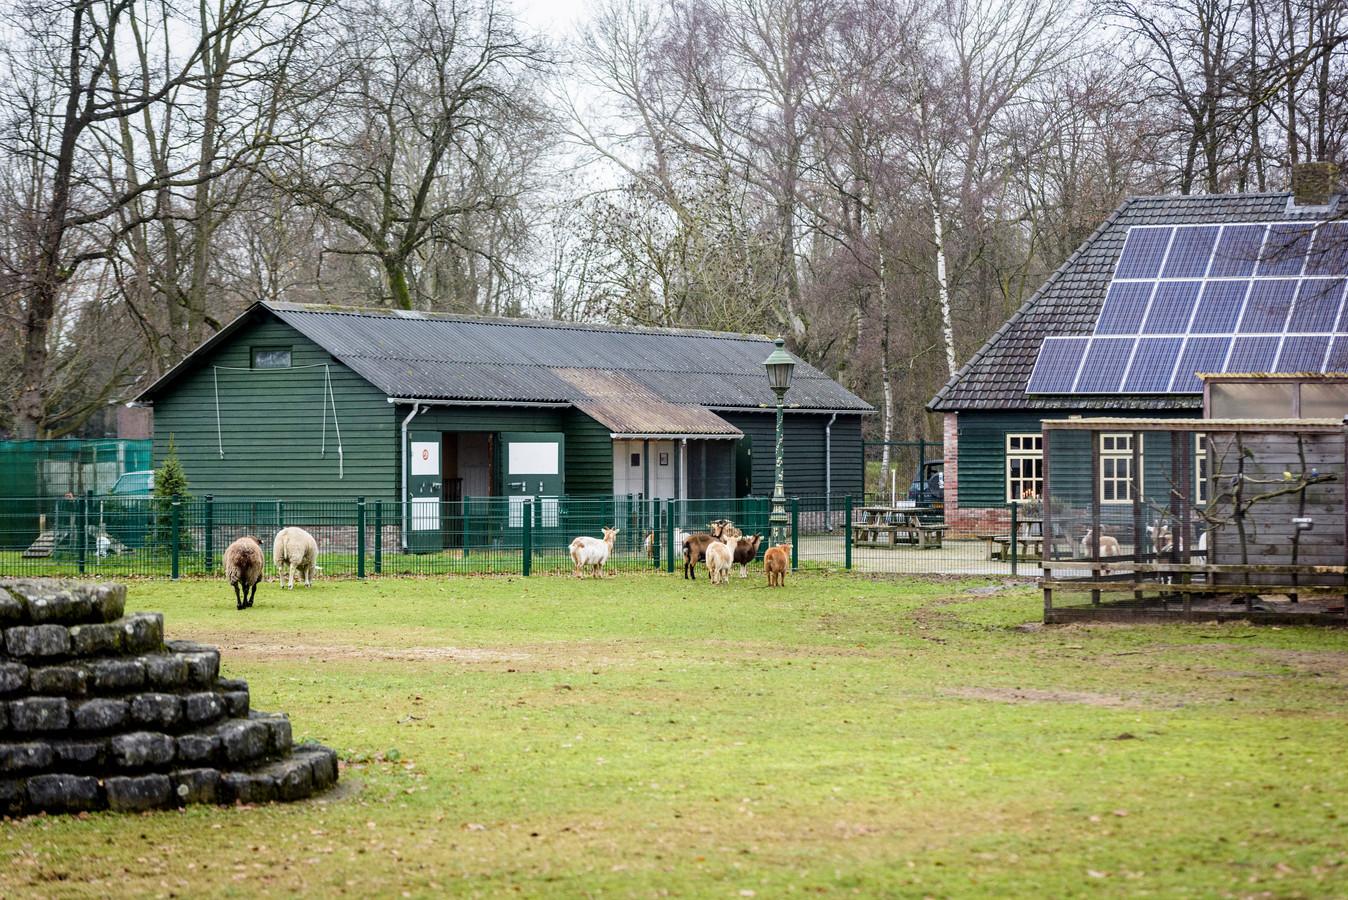 Kinderboerderij De Kleine Meer in Valkenswaard.